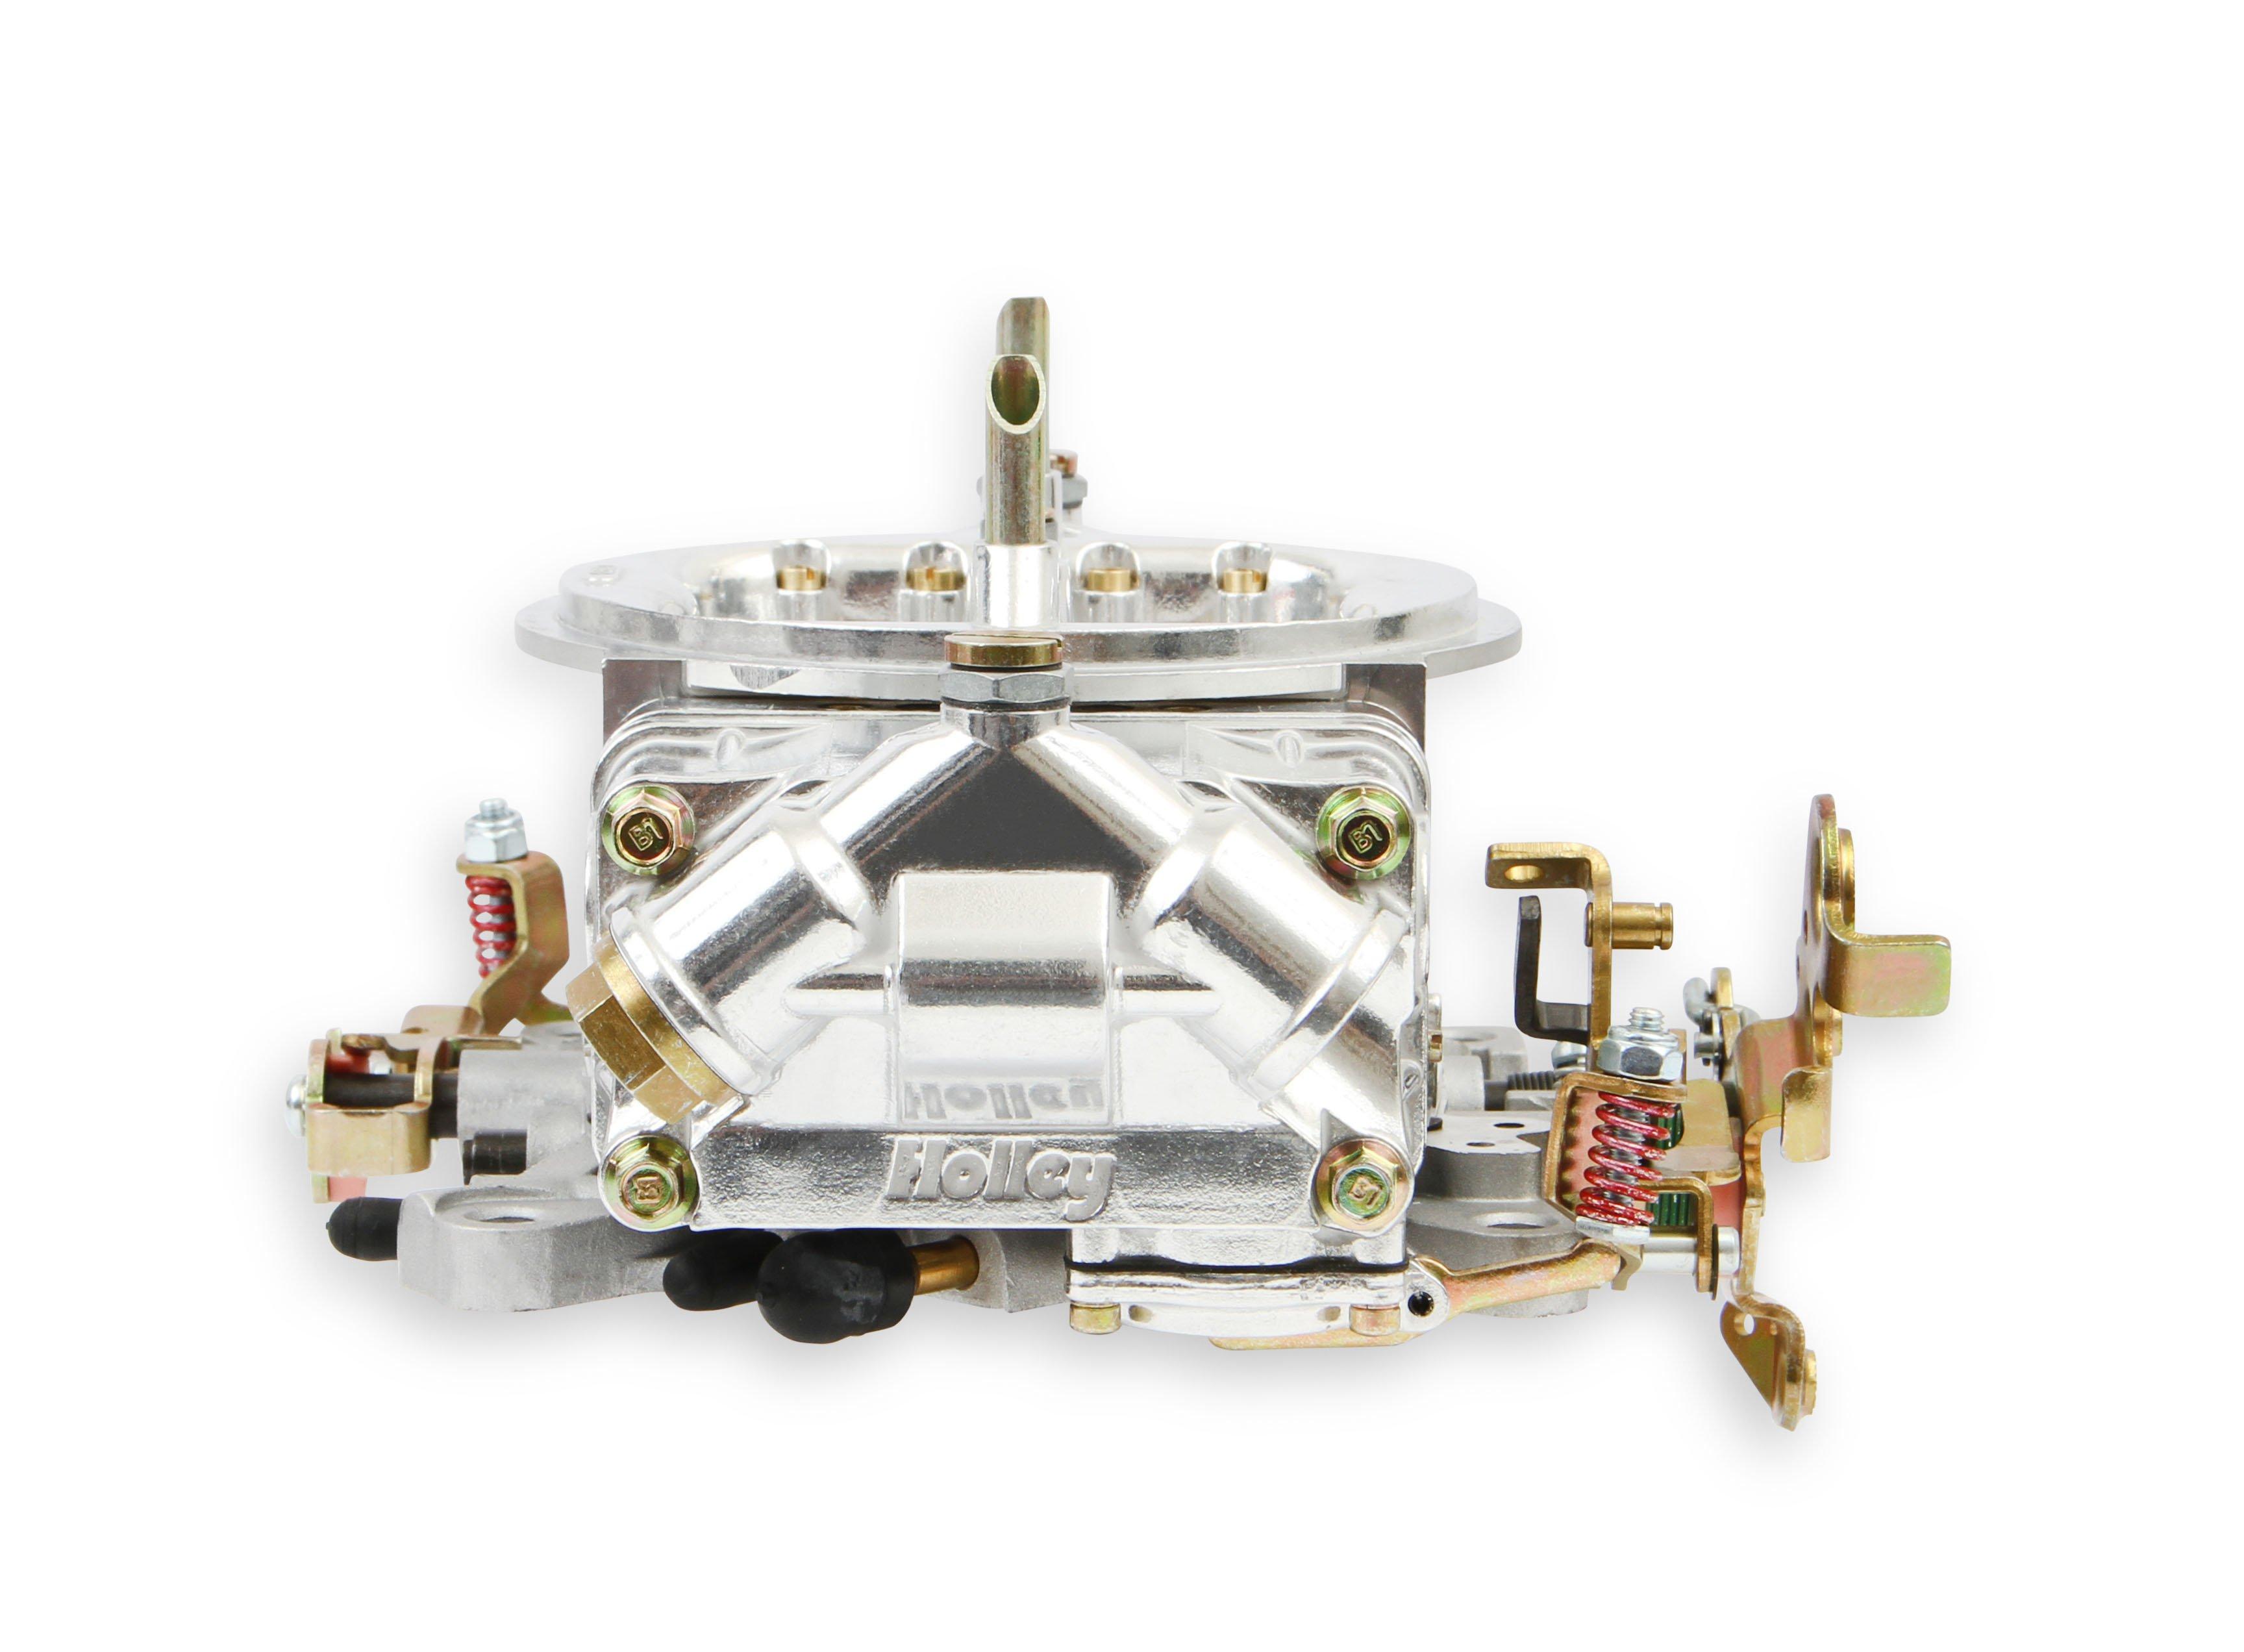 QUICK FUEL 850 CFM Carburetor Center Main Body ALUMINUM FITS HOLLEY HP 6-850